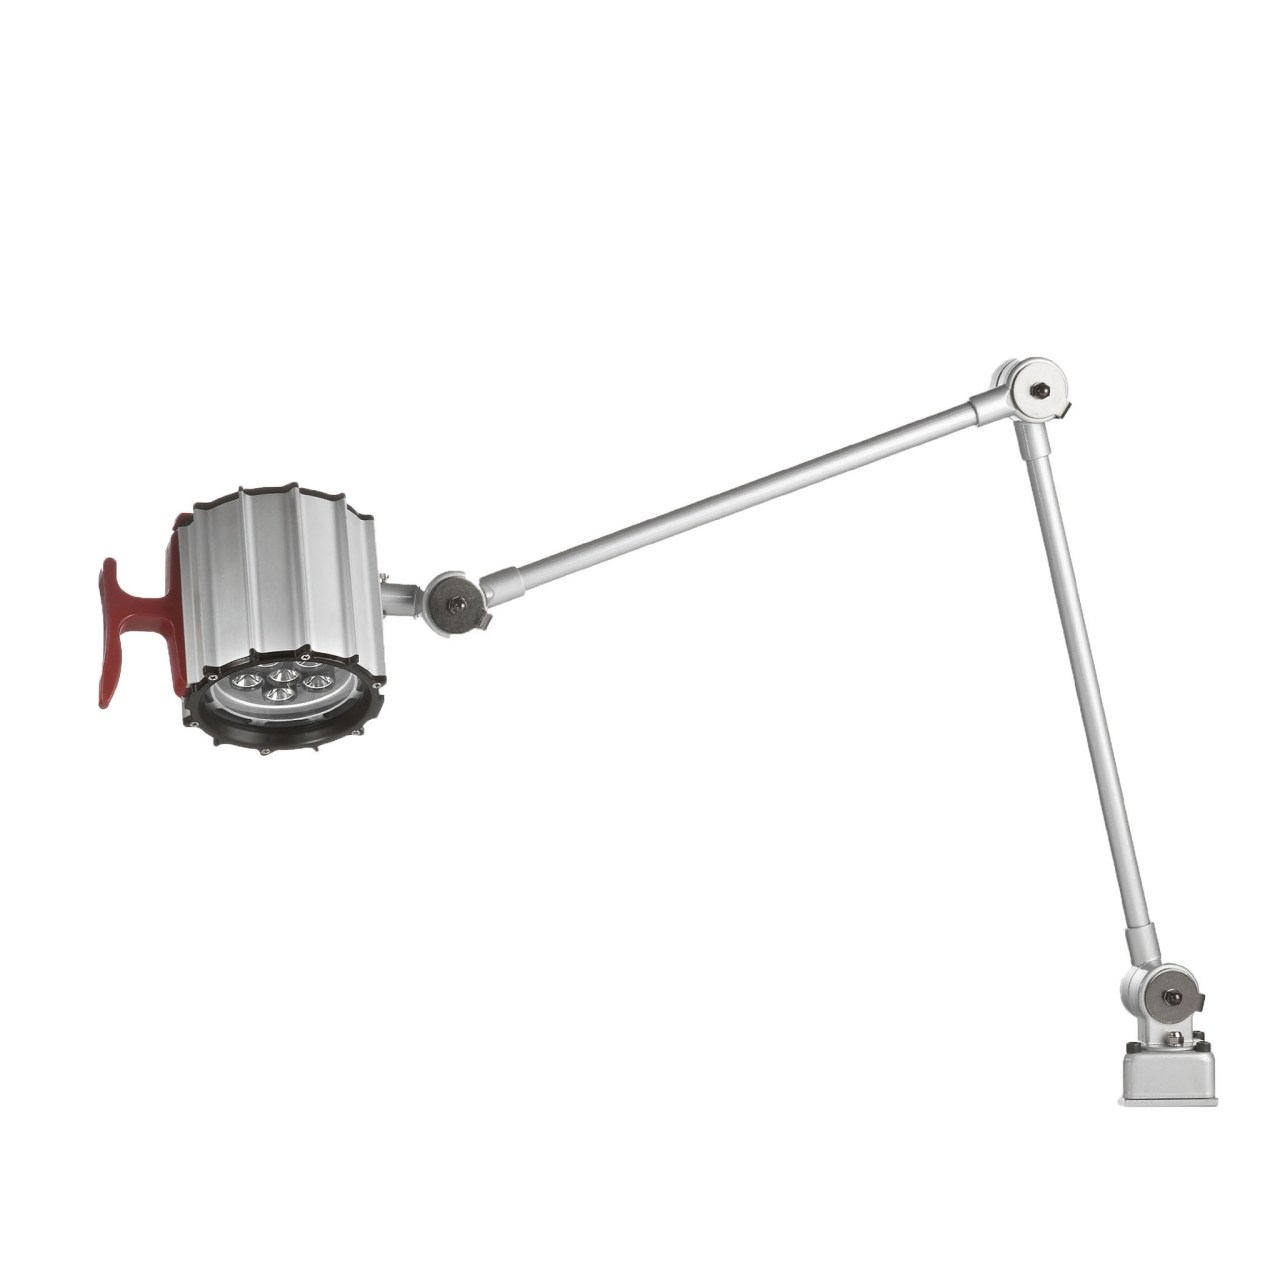 LED-Maschinenleuchte SIS-Licht M-Lite IP 65 RL